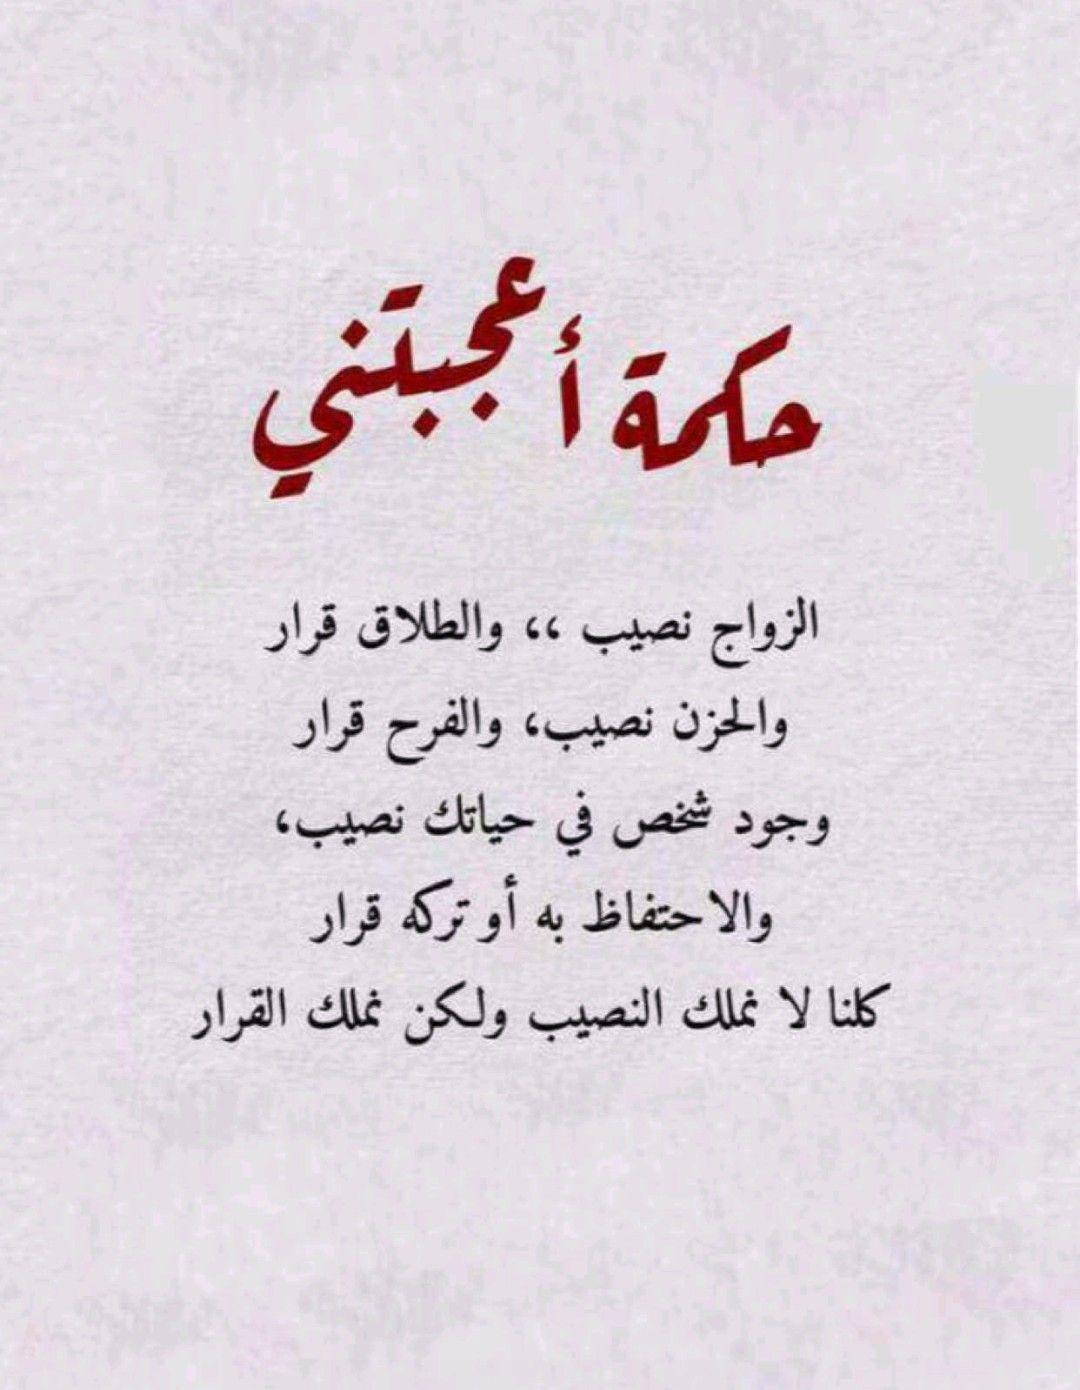 بالقرار نغير الواقع Words Quotes Inspirational Quotes Funny Arabic Quotes